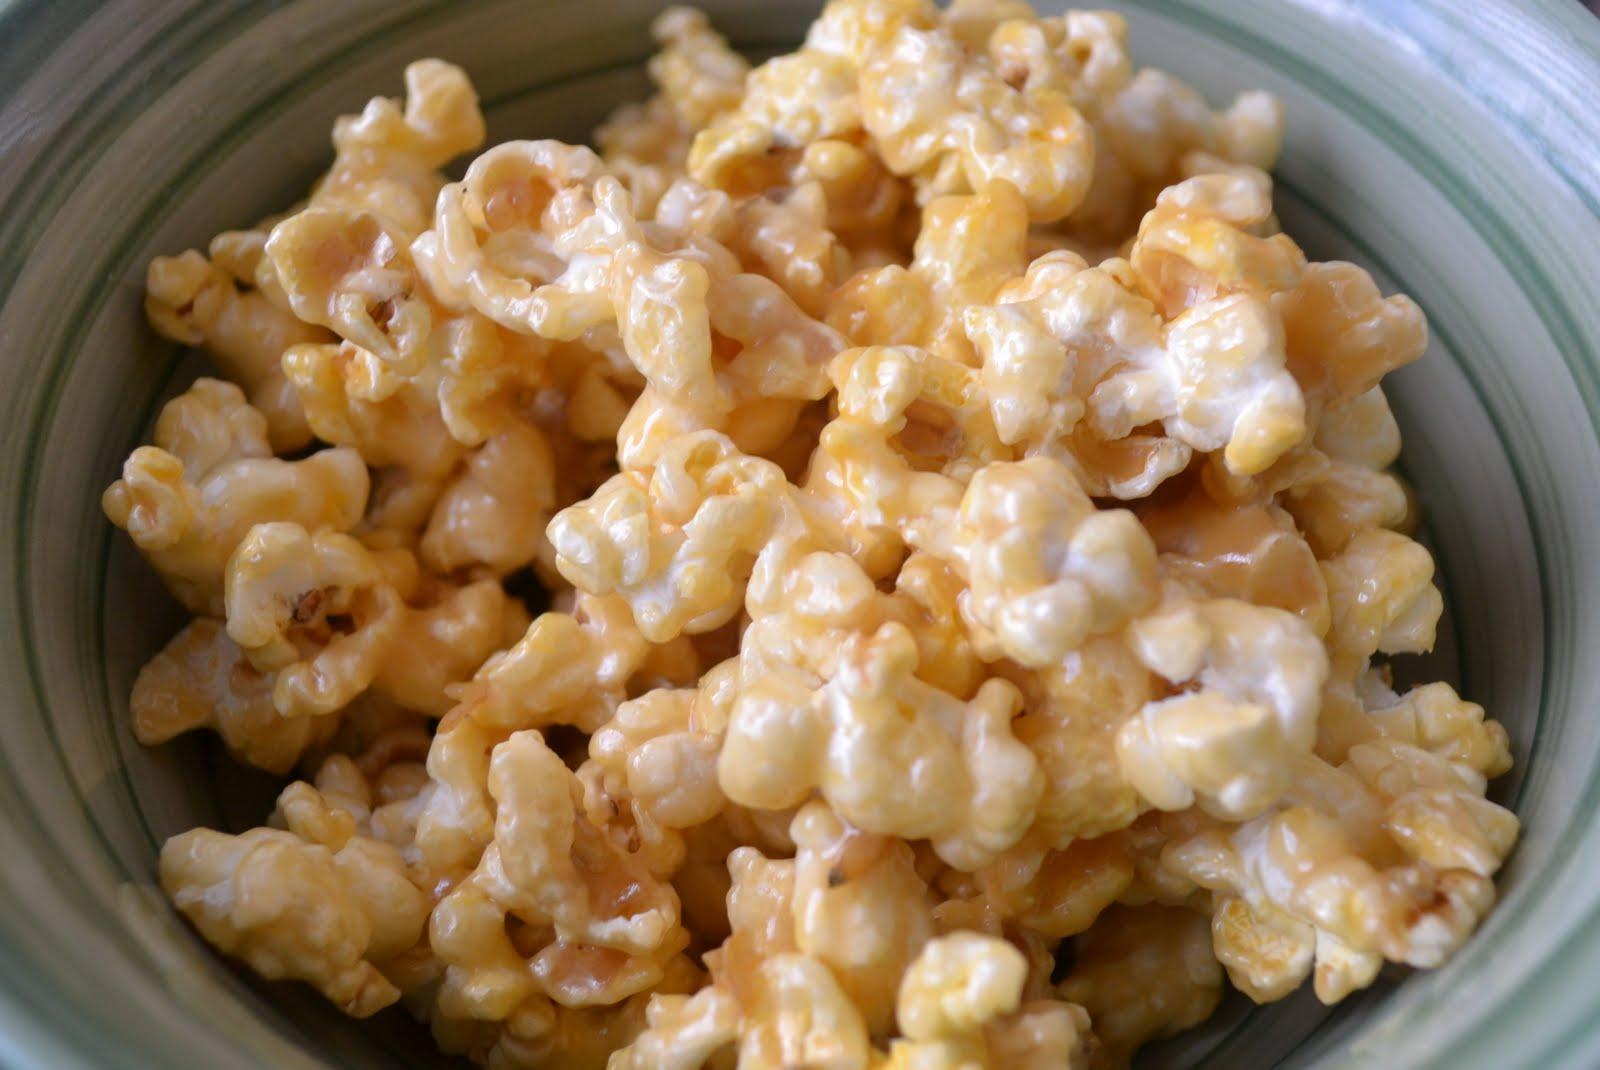 Miranda's Recipes: Caramel Popcorn